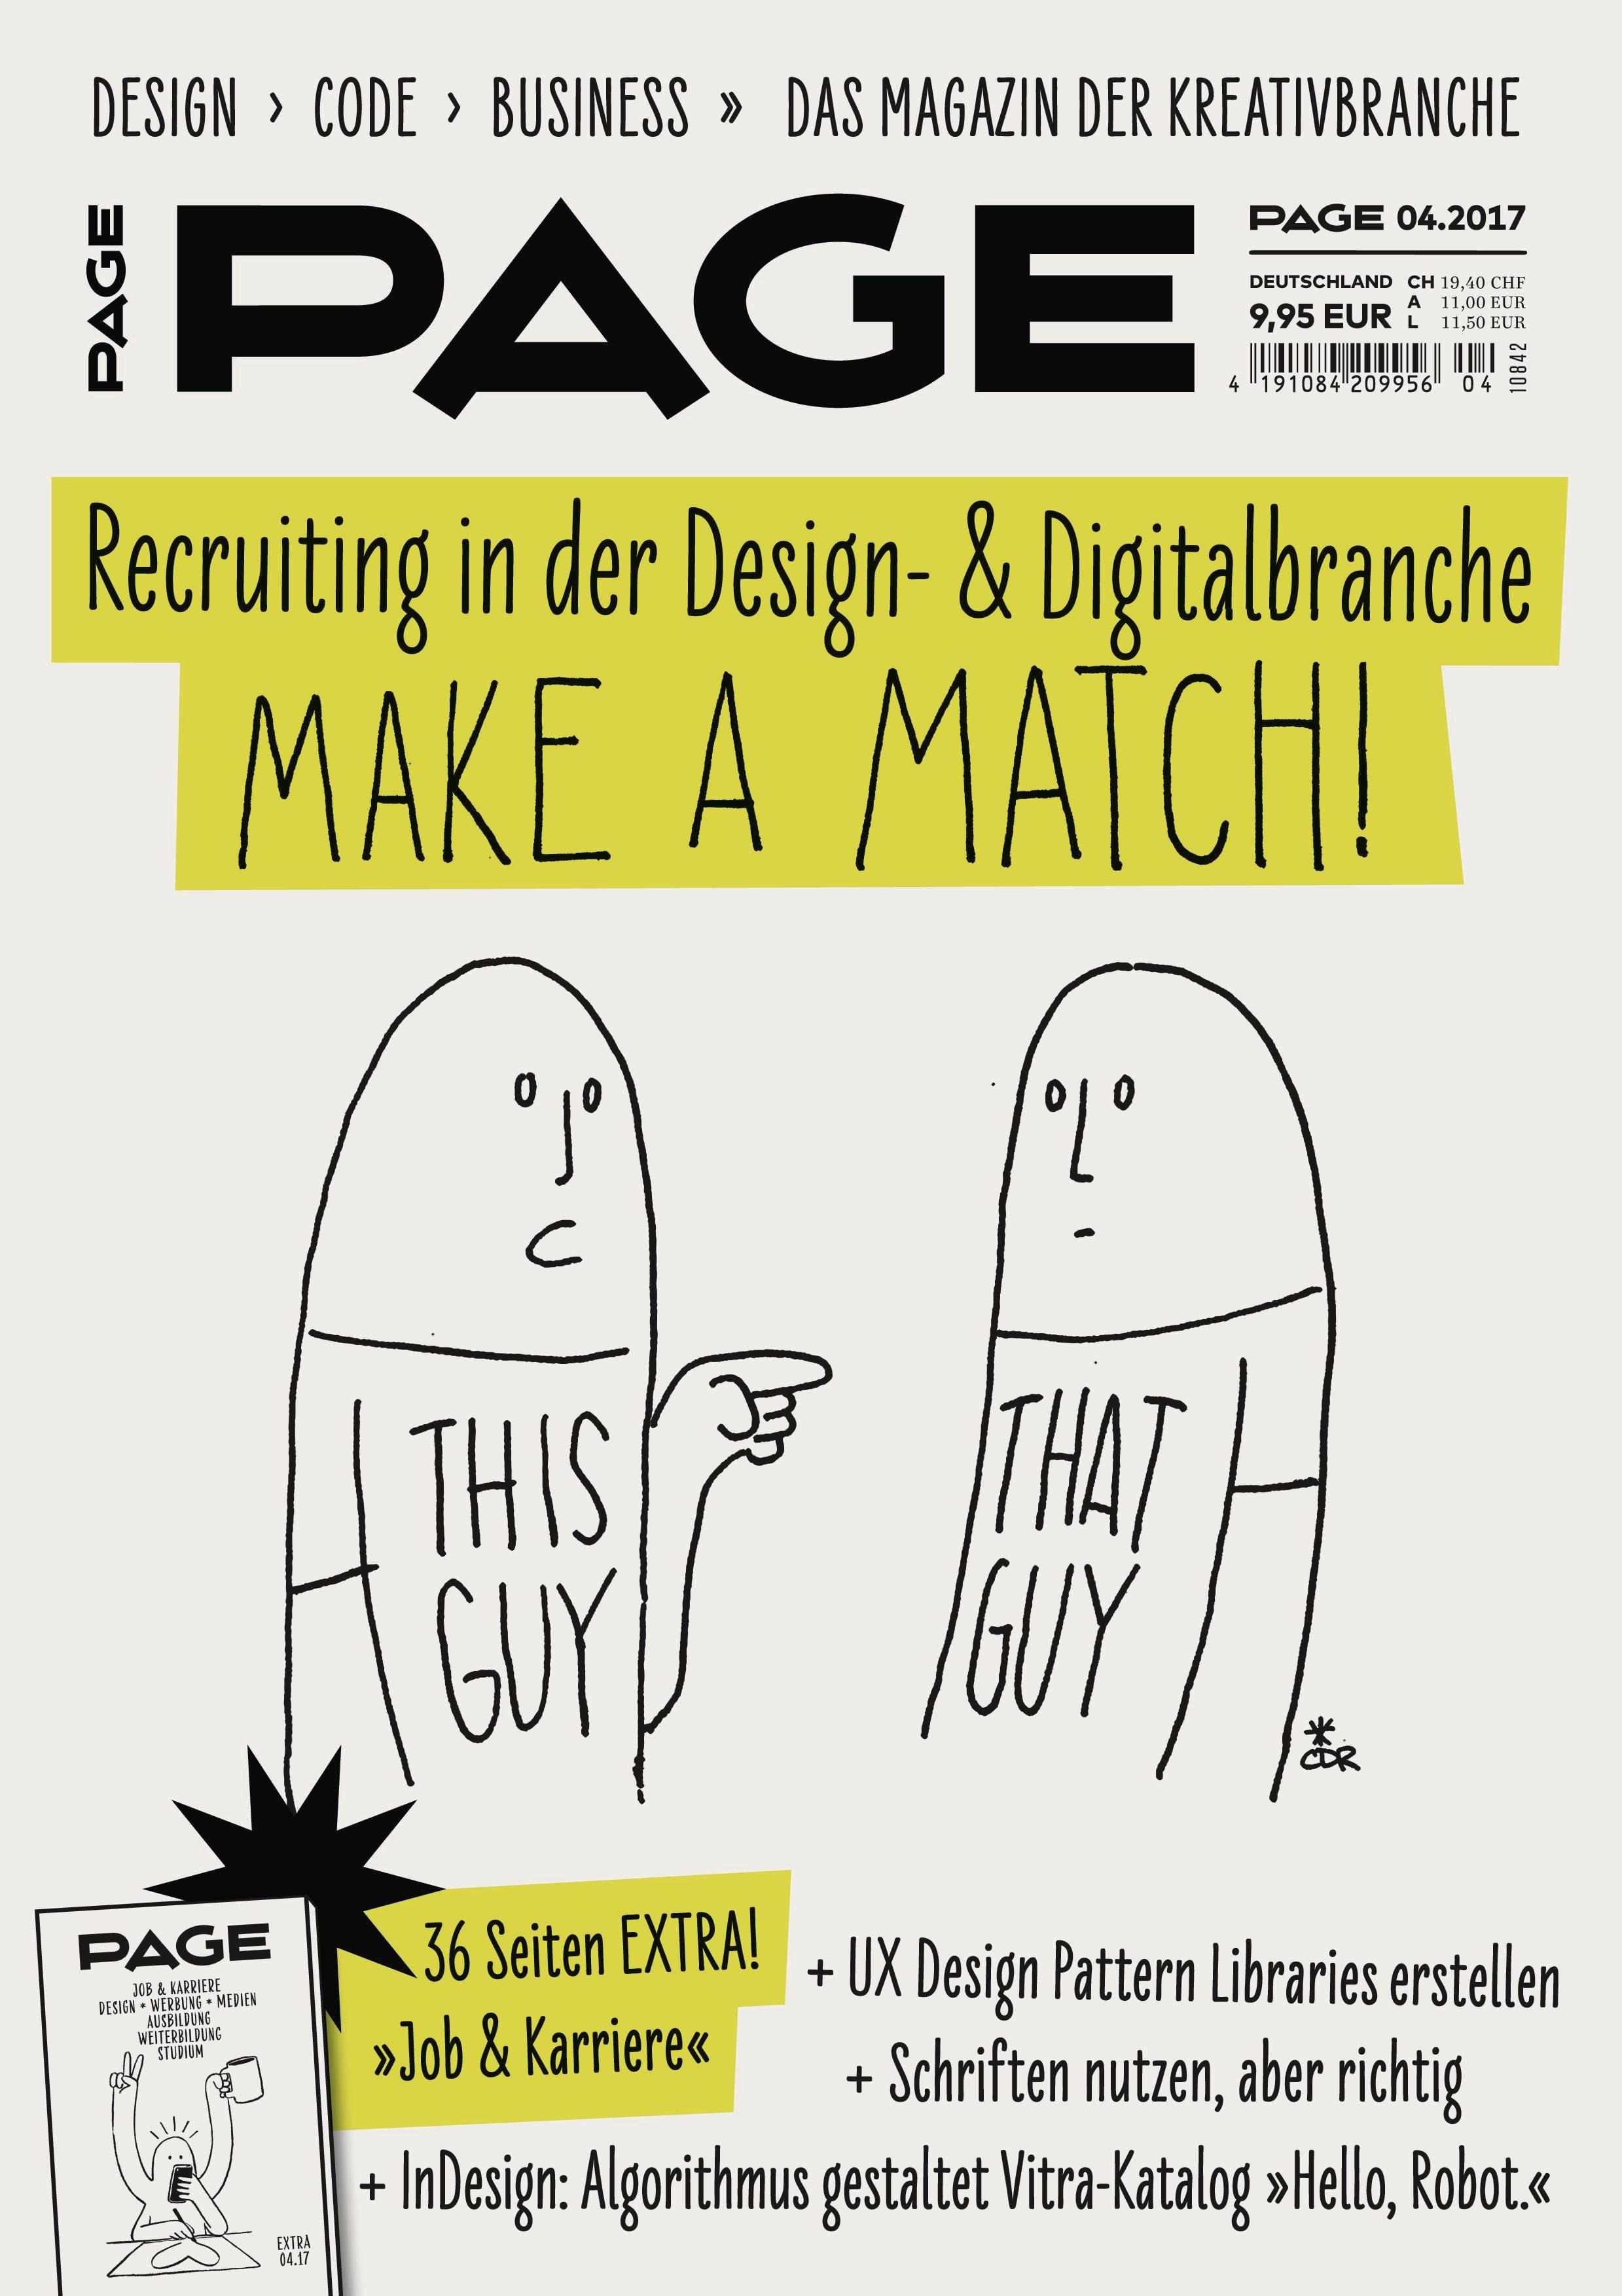 Recruiting, Akquise, Human Resources, Jobsuche, Freelancer, Designer, Developer, Google, Xing, Snapchat